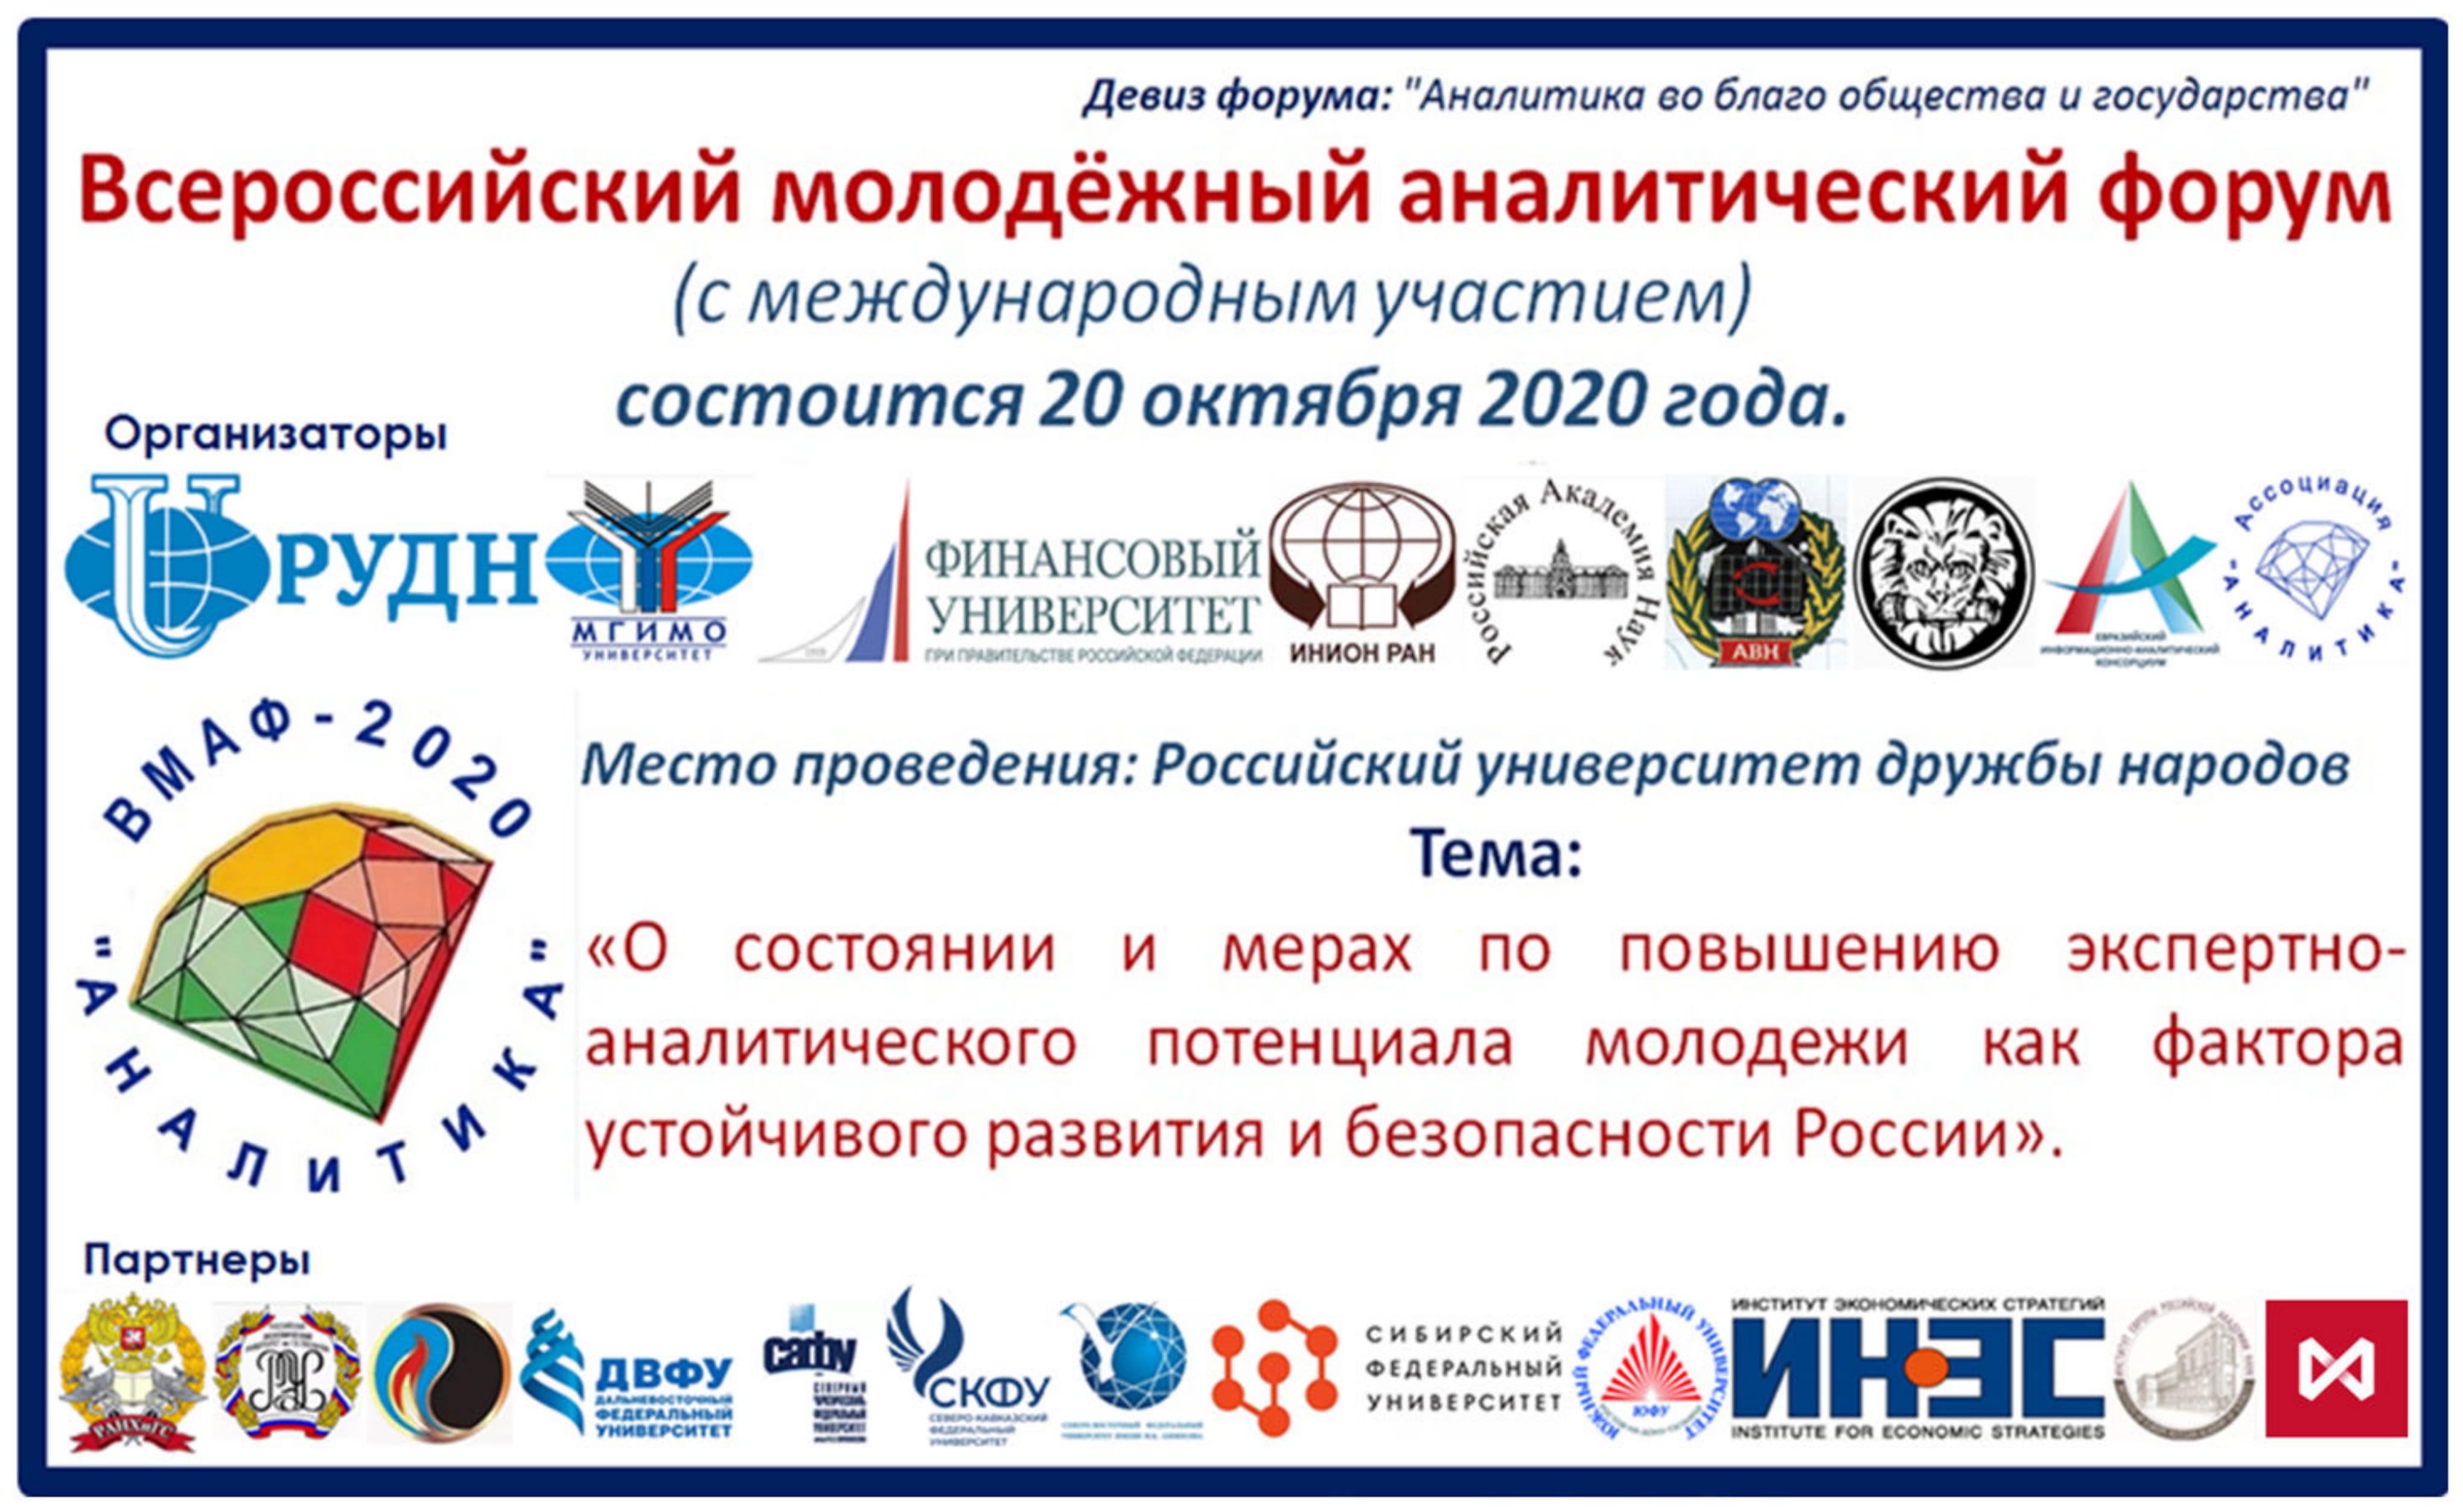 ВМАФ-2020 баннер 1- 1.jpg